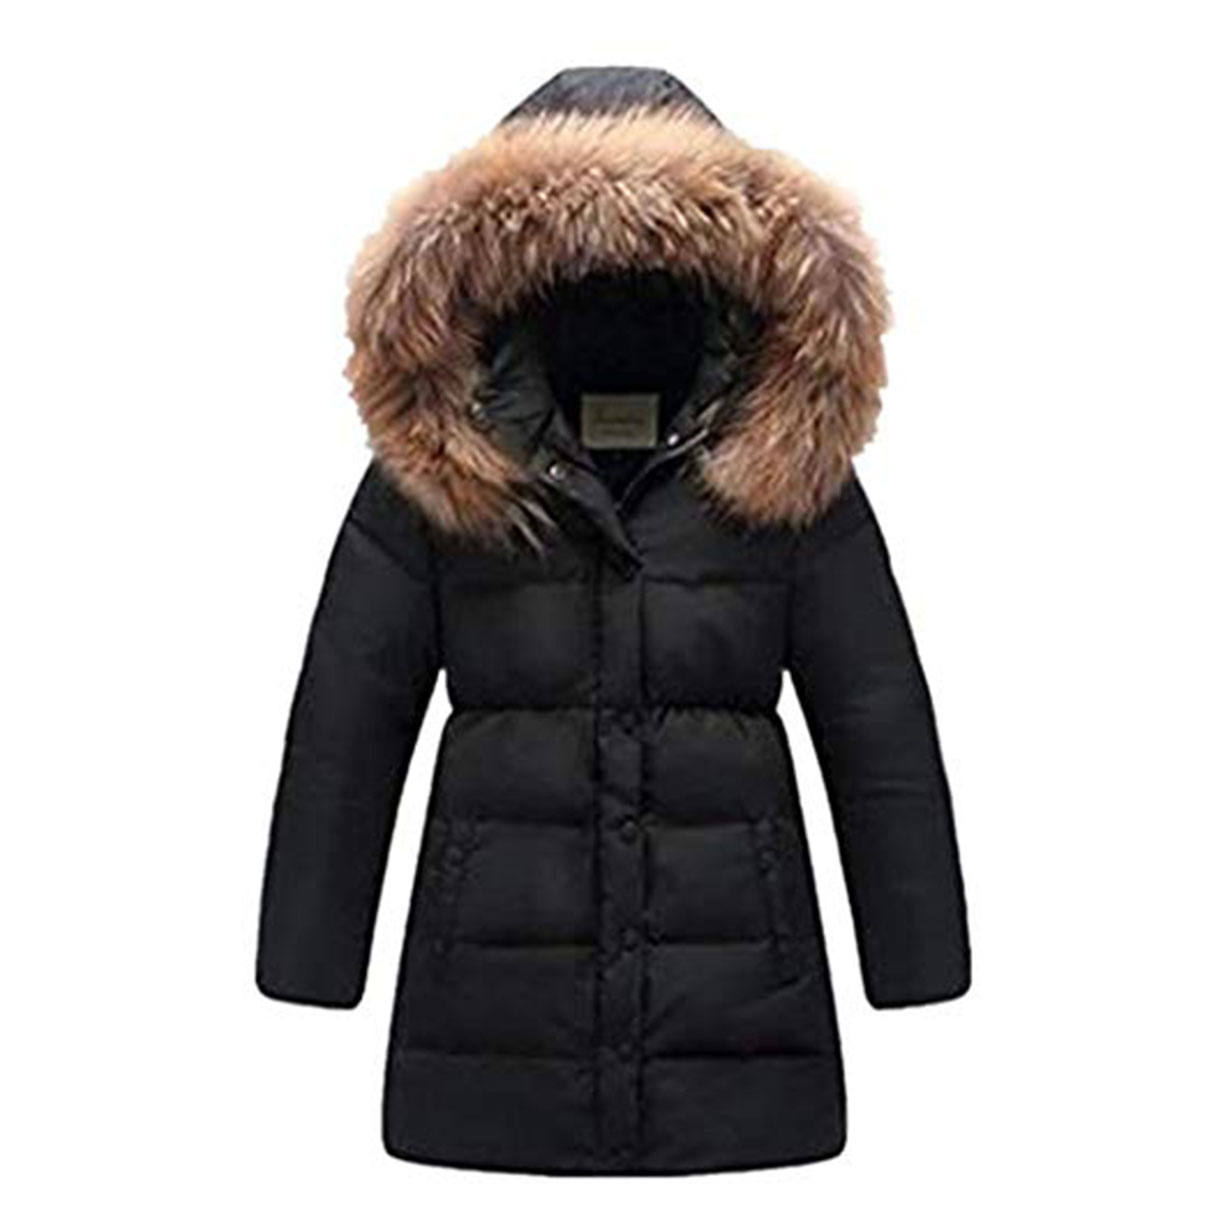 d25a9277dd72 Details about Girls Winter Down Jacket Thick Hooded Kids Outwear Warm Coat  Fur Collar Parka